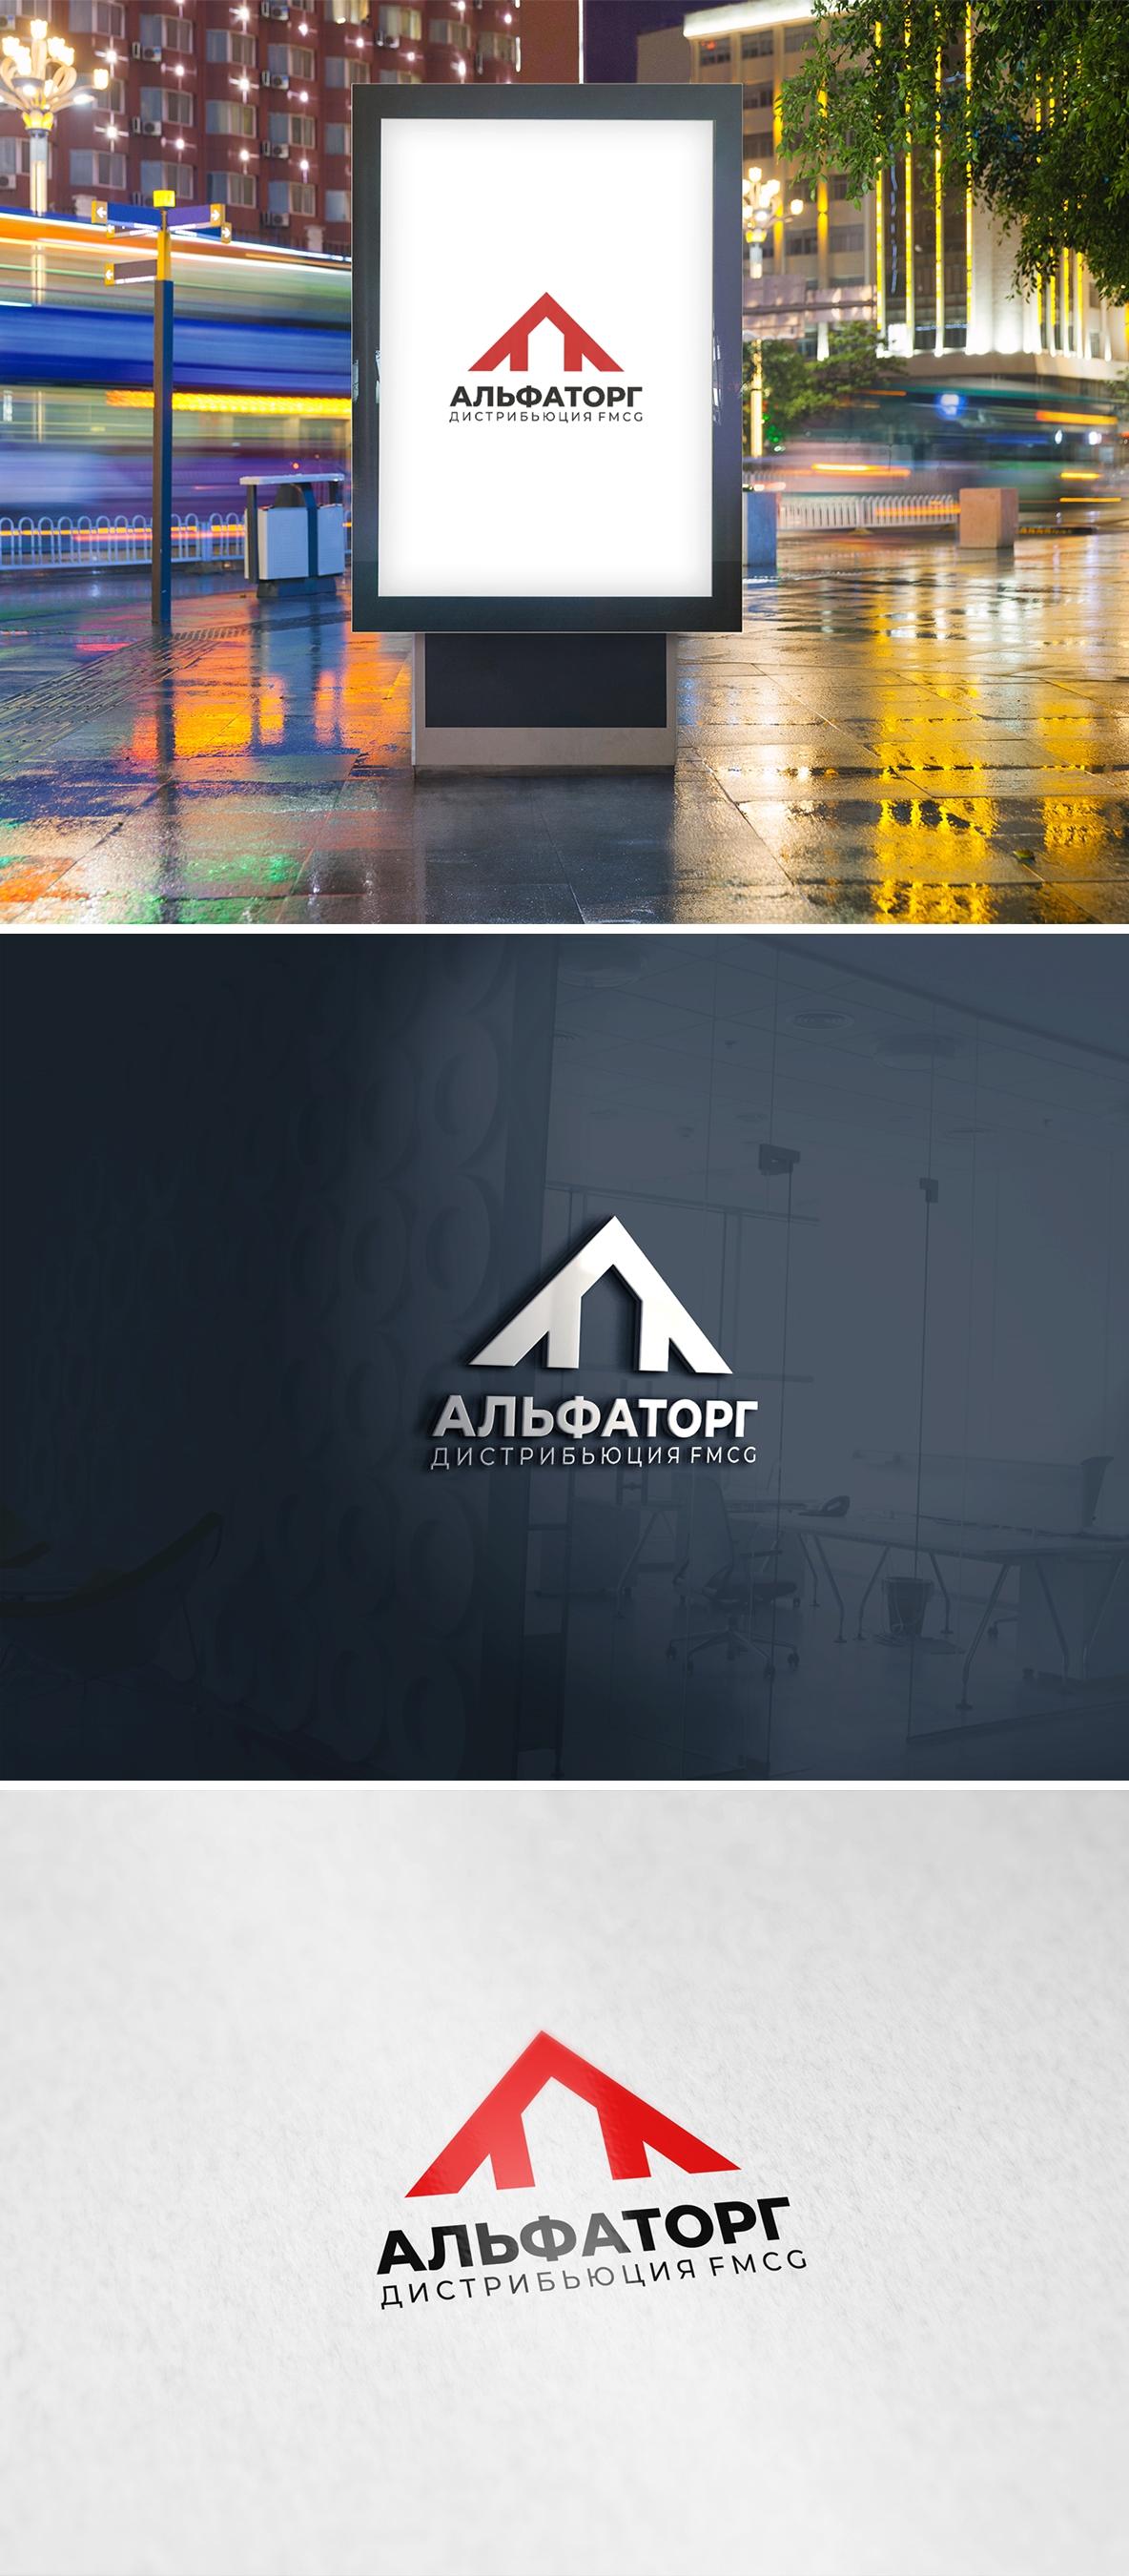 Логотип и фирменный стиль фото f_8995eff407310389.jpg